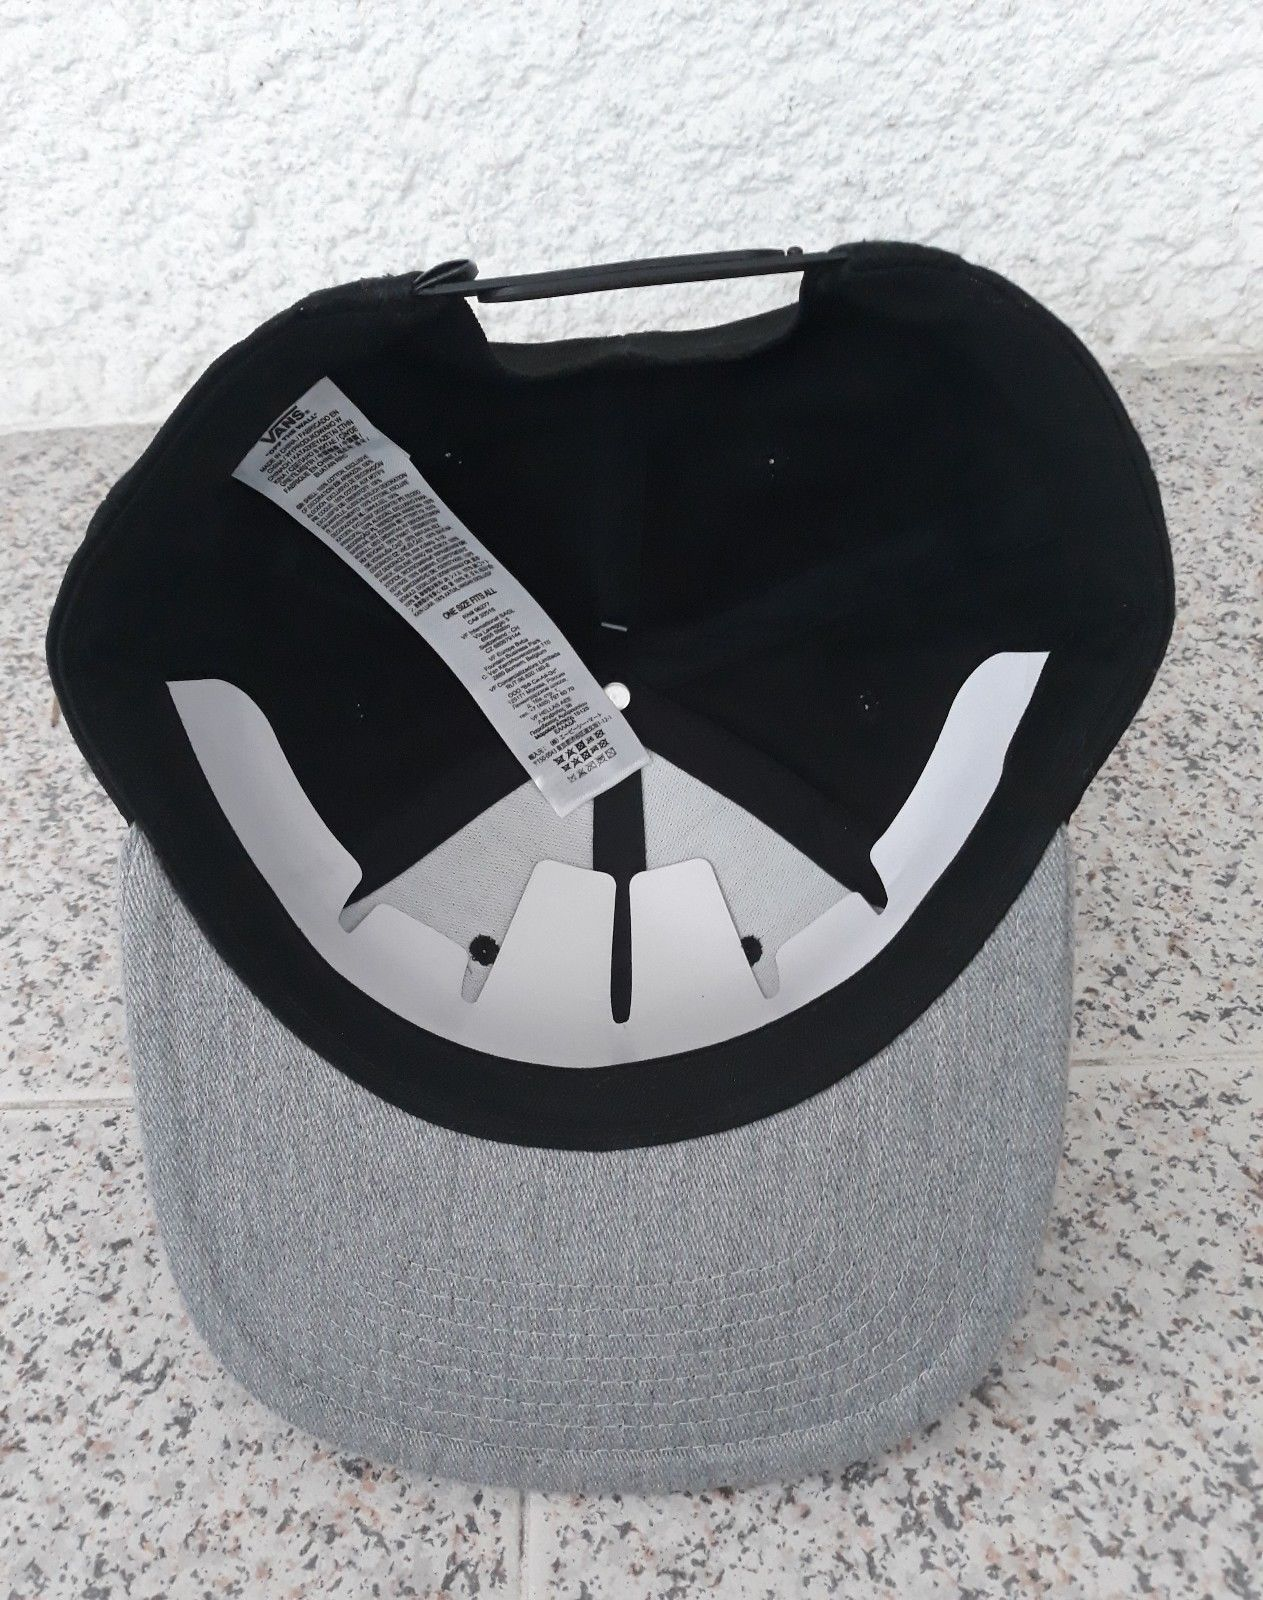 Vans Black Cap Grey Casual Hat 100% Cotton Adults One Size  Flat Brim 6 Panel